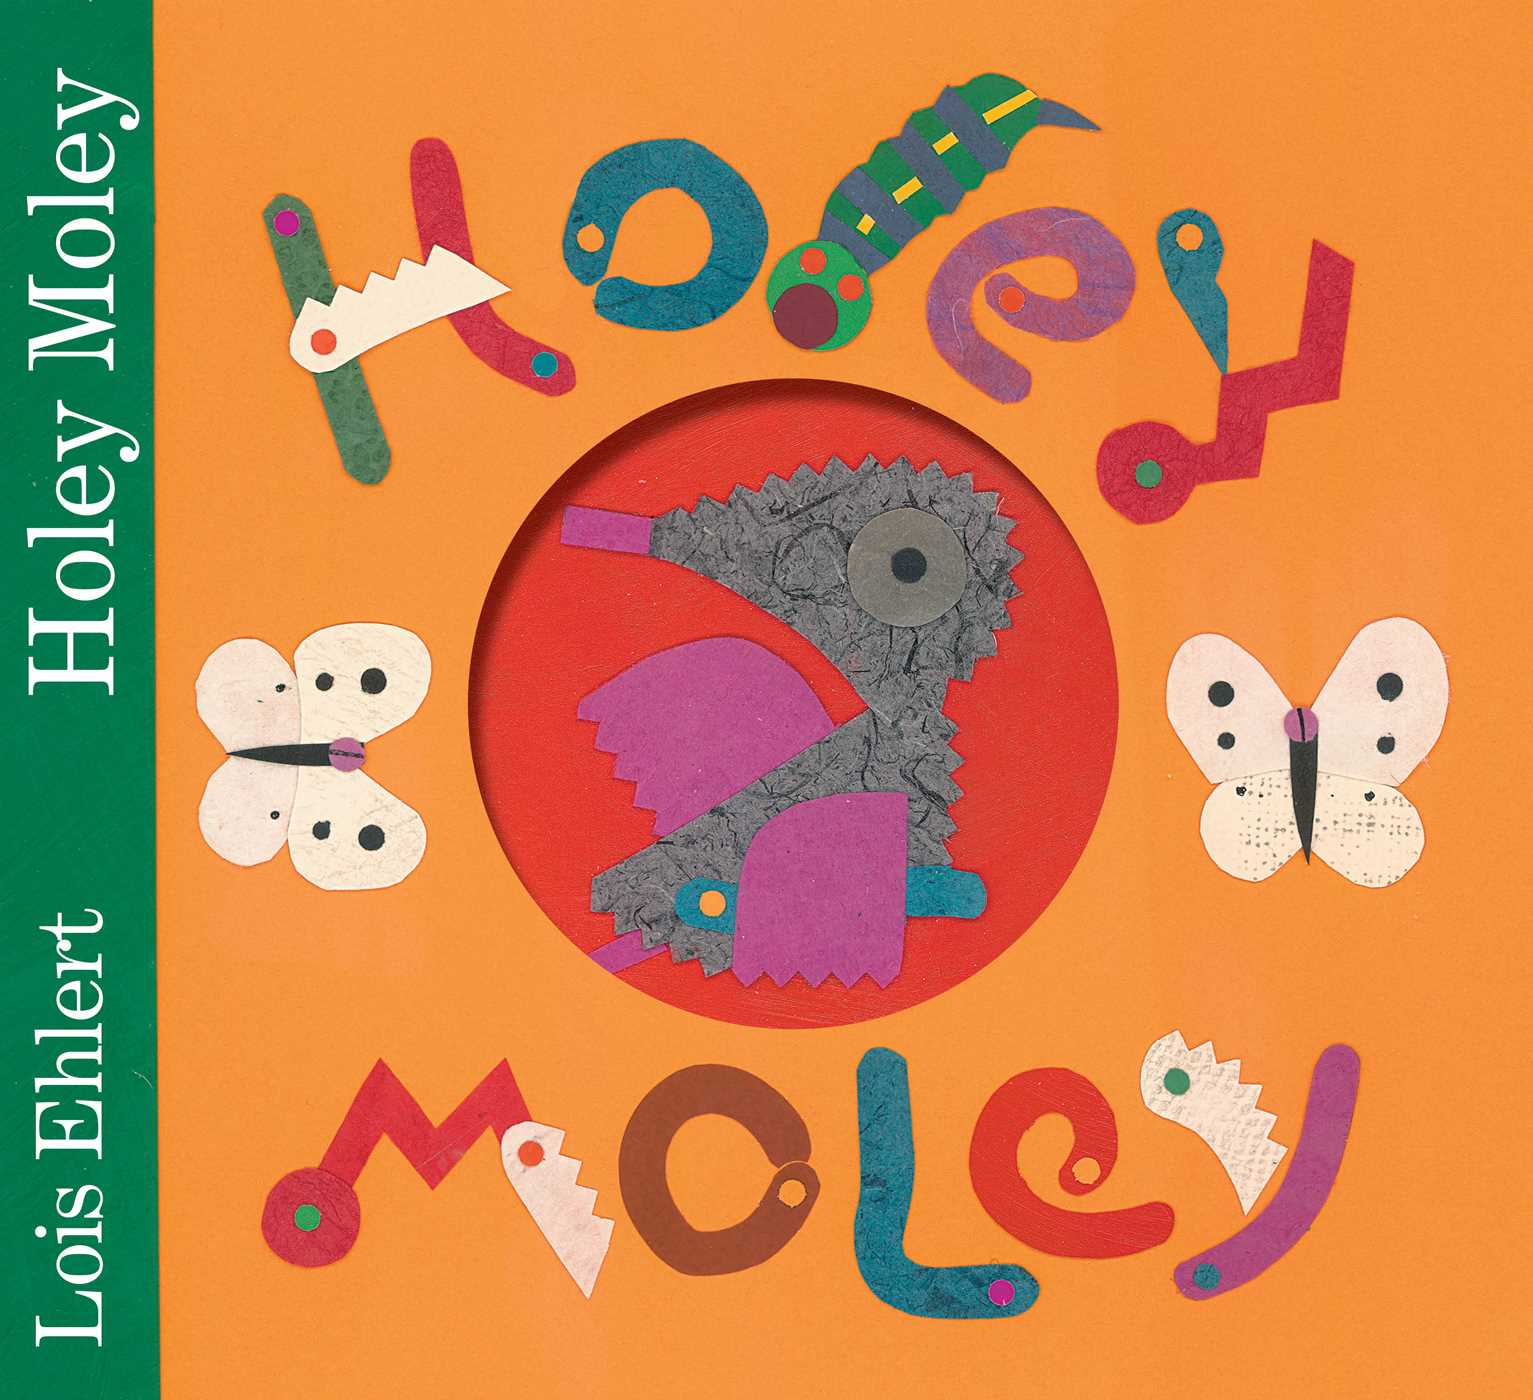 Holey moley 9781442493018 hr